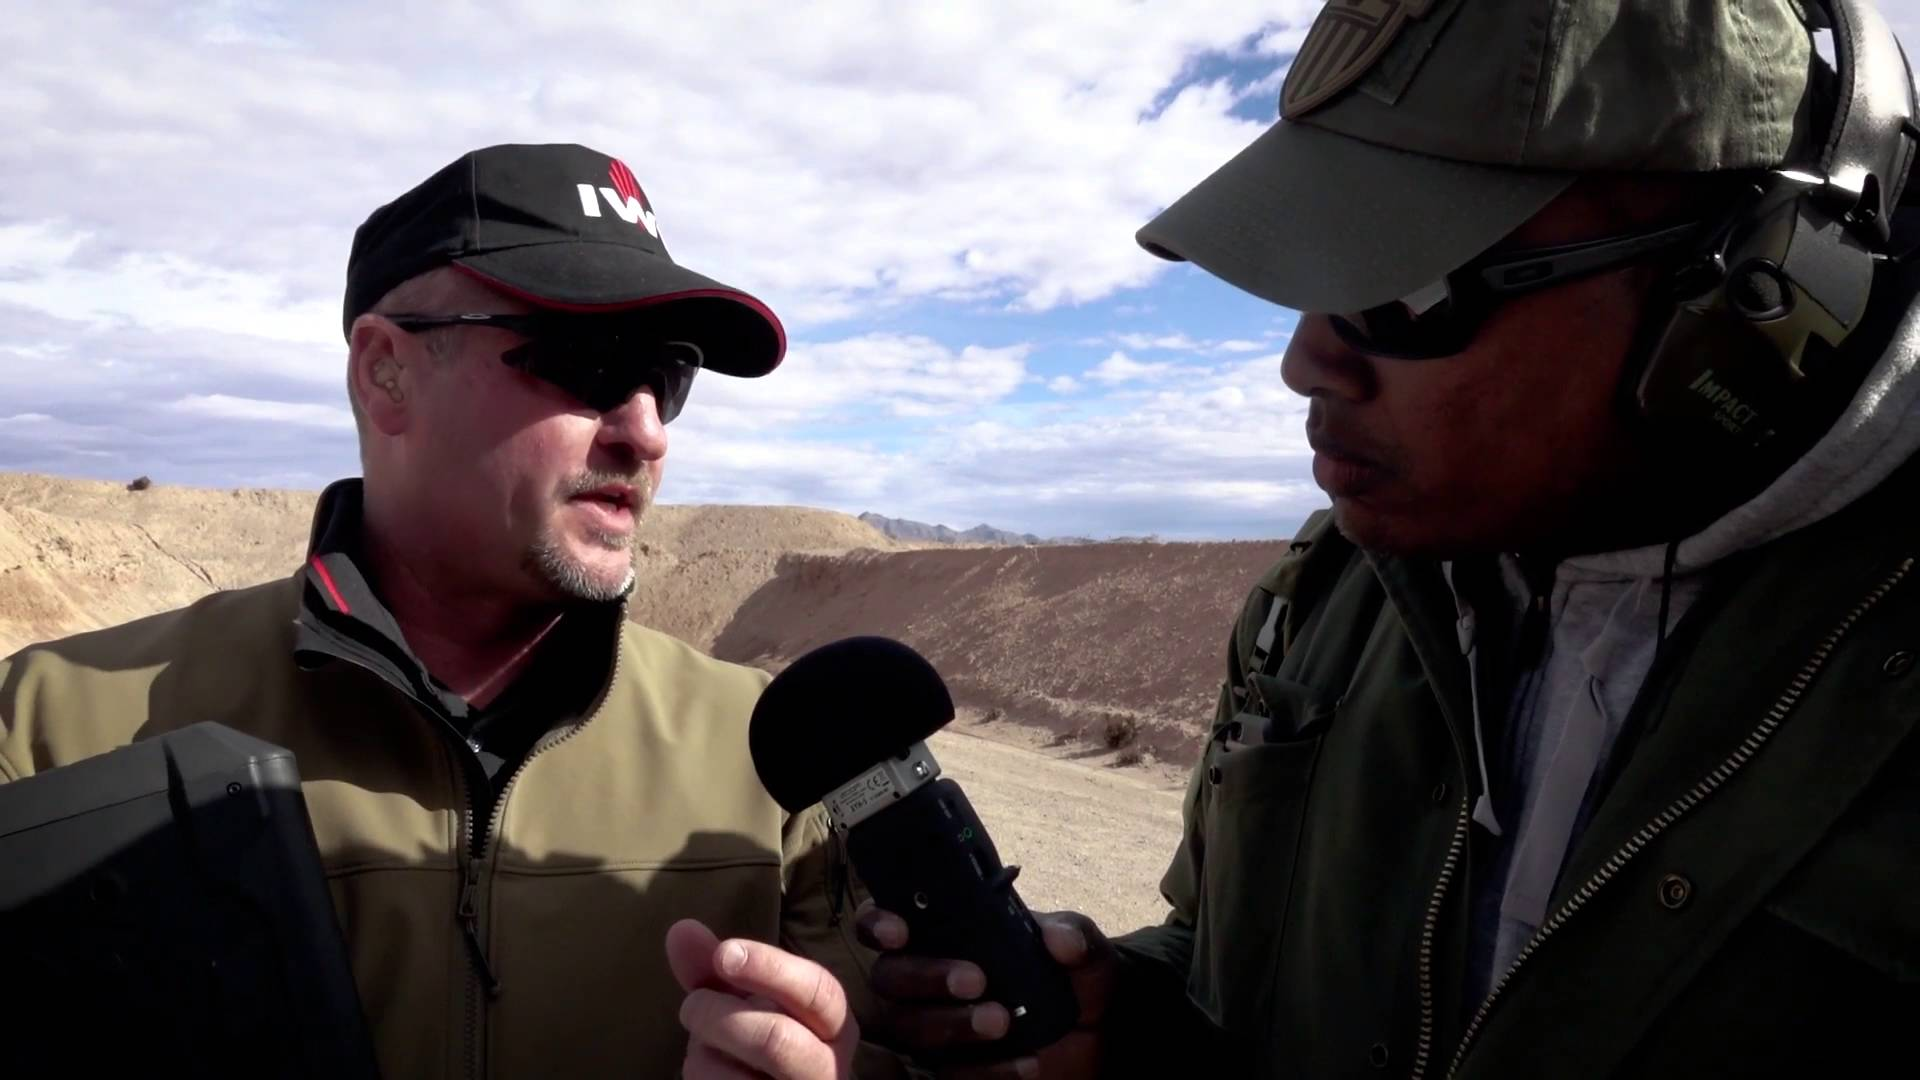 IWI Tavor 300 Blackout SHOT Show 2016 Media Day GunsAmerica